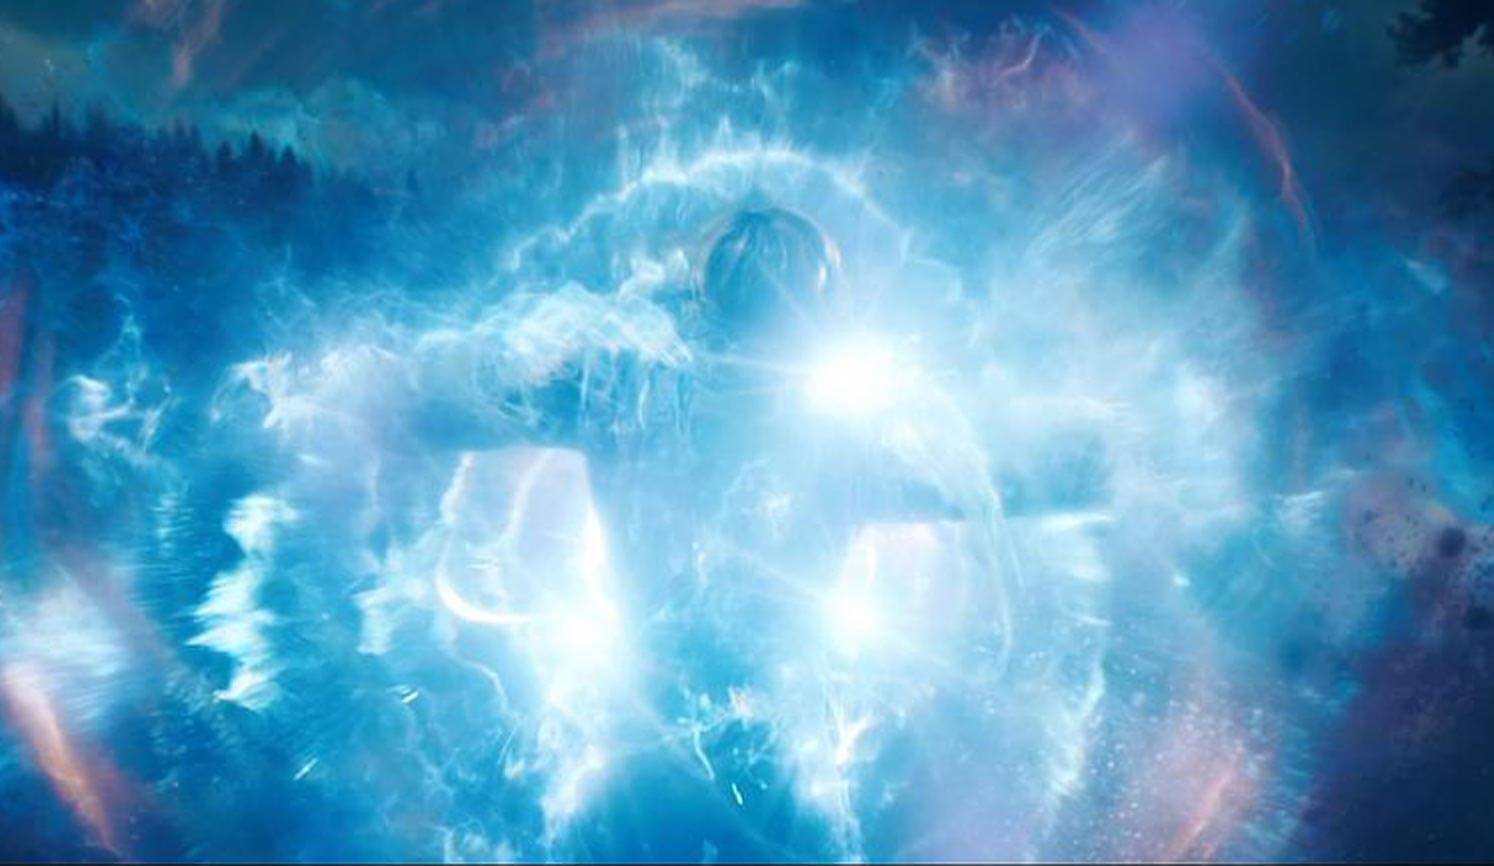 'Captain Marvel' Drops Eye-Popping New Poster Ahead Of New Trailer